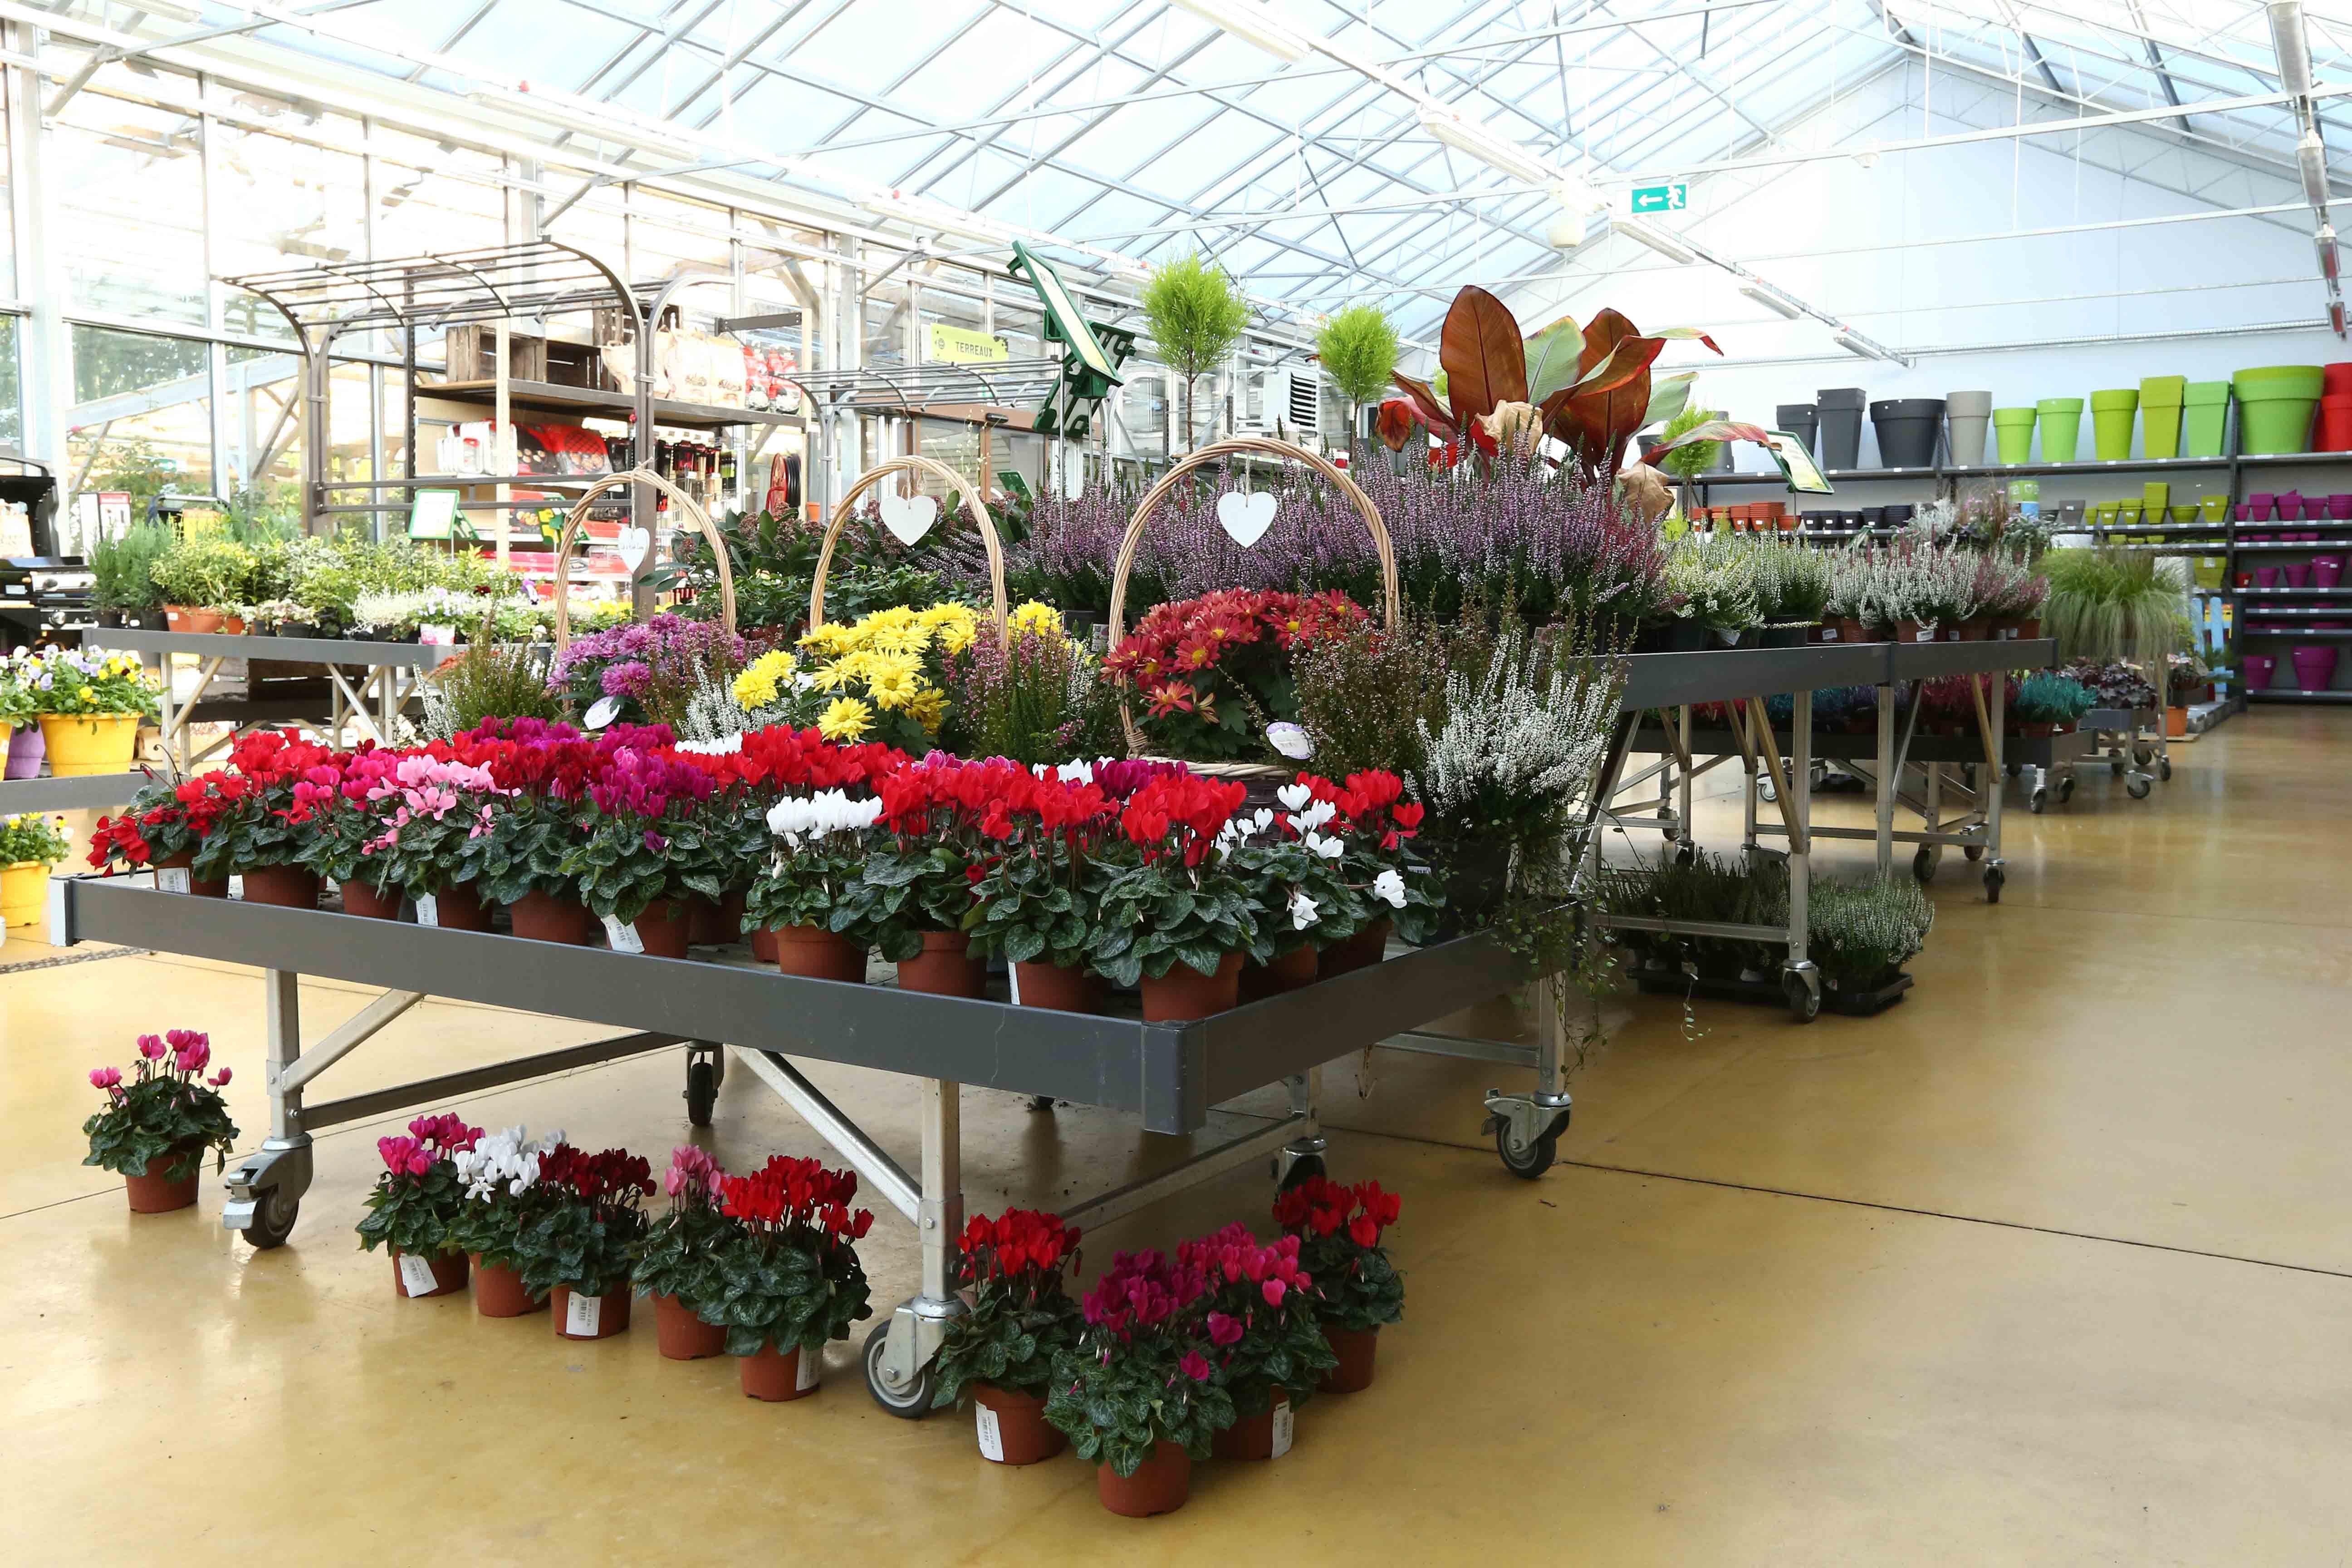 Tablar Jardinerie Agencement Vertdis Gamm Vert Mobilier